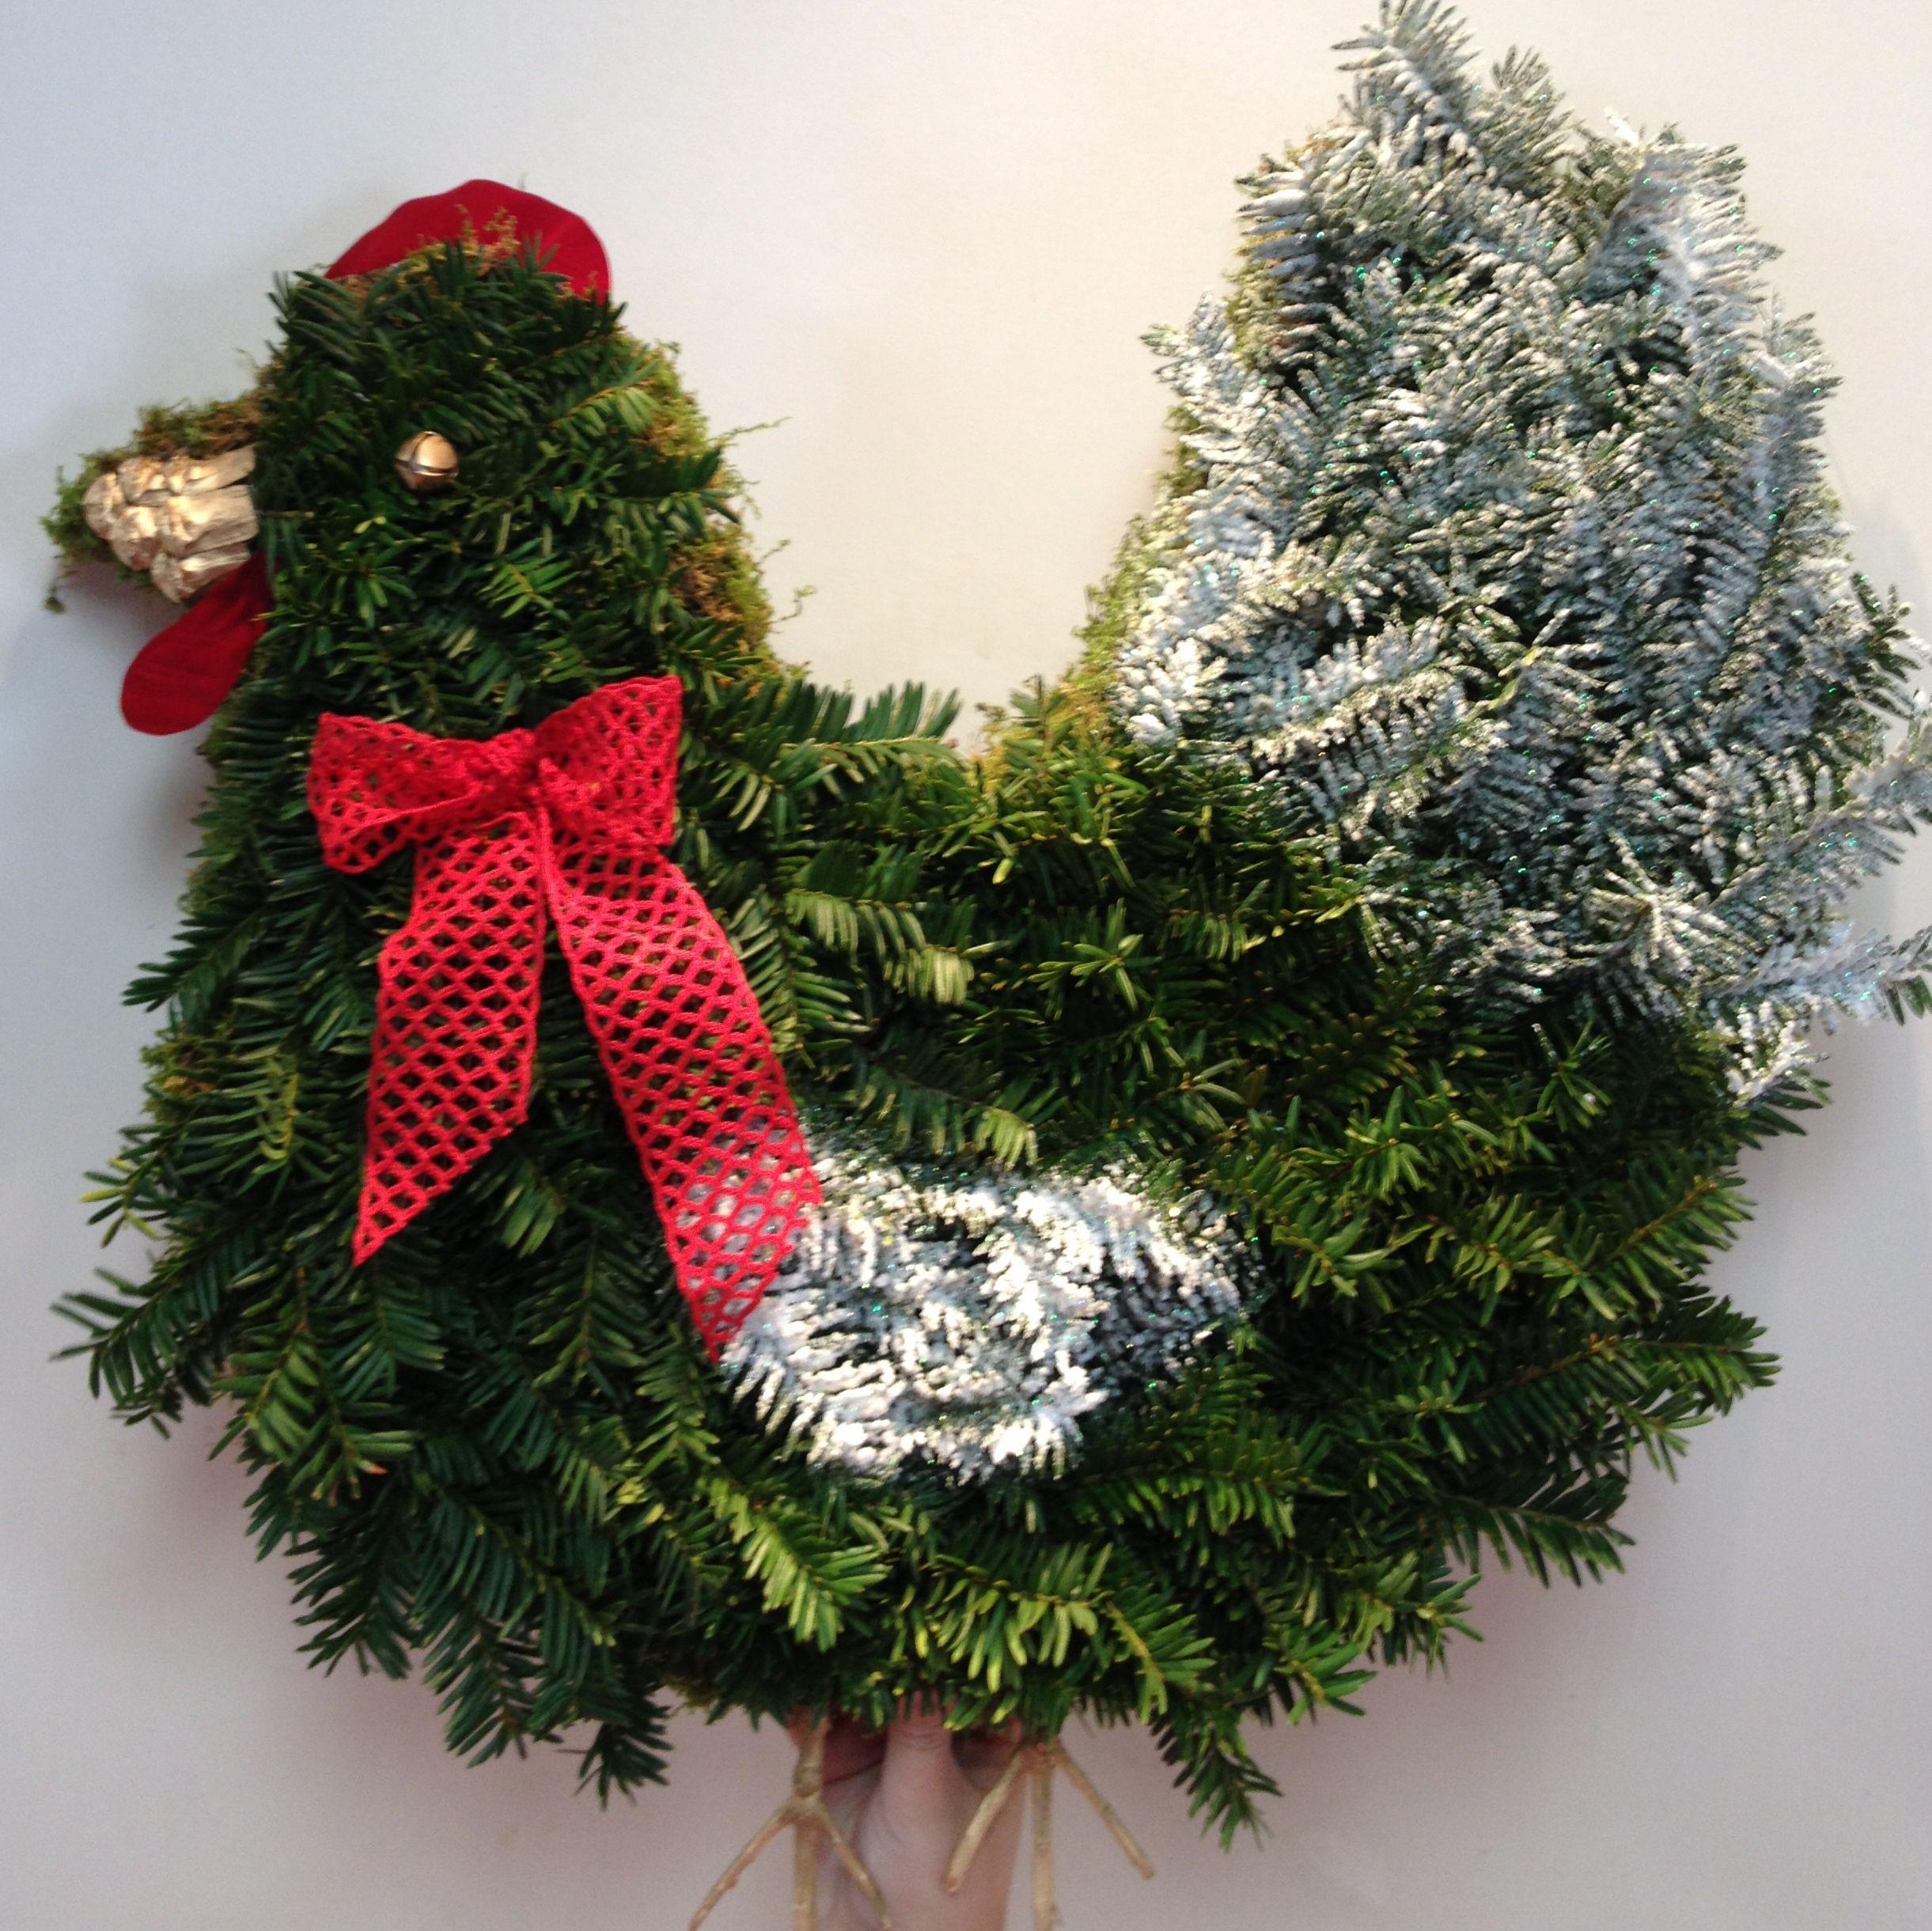 Christmas Door Frame Decorations: Chicken Christmas Door Decoration. Who Needs A Wreath